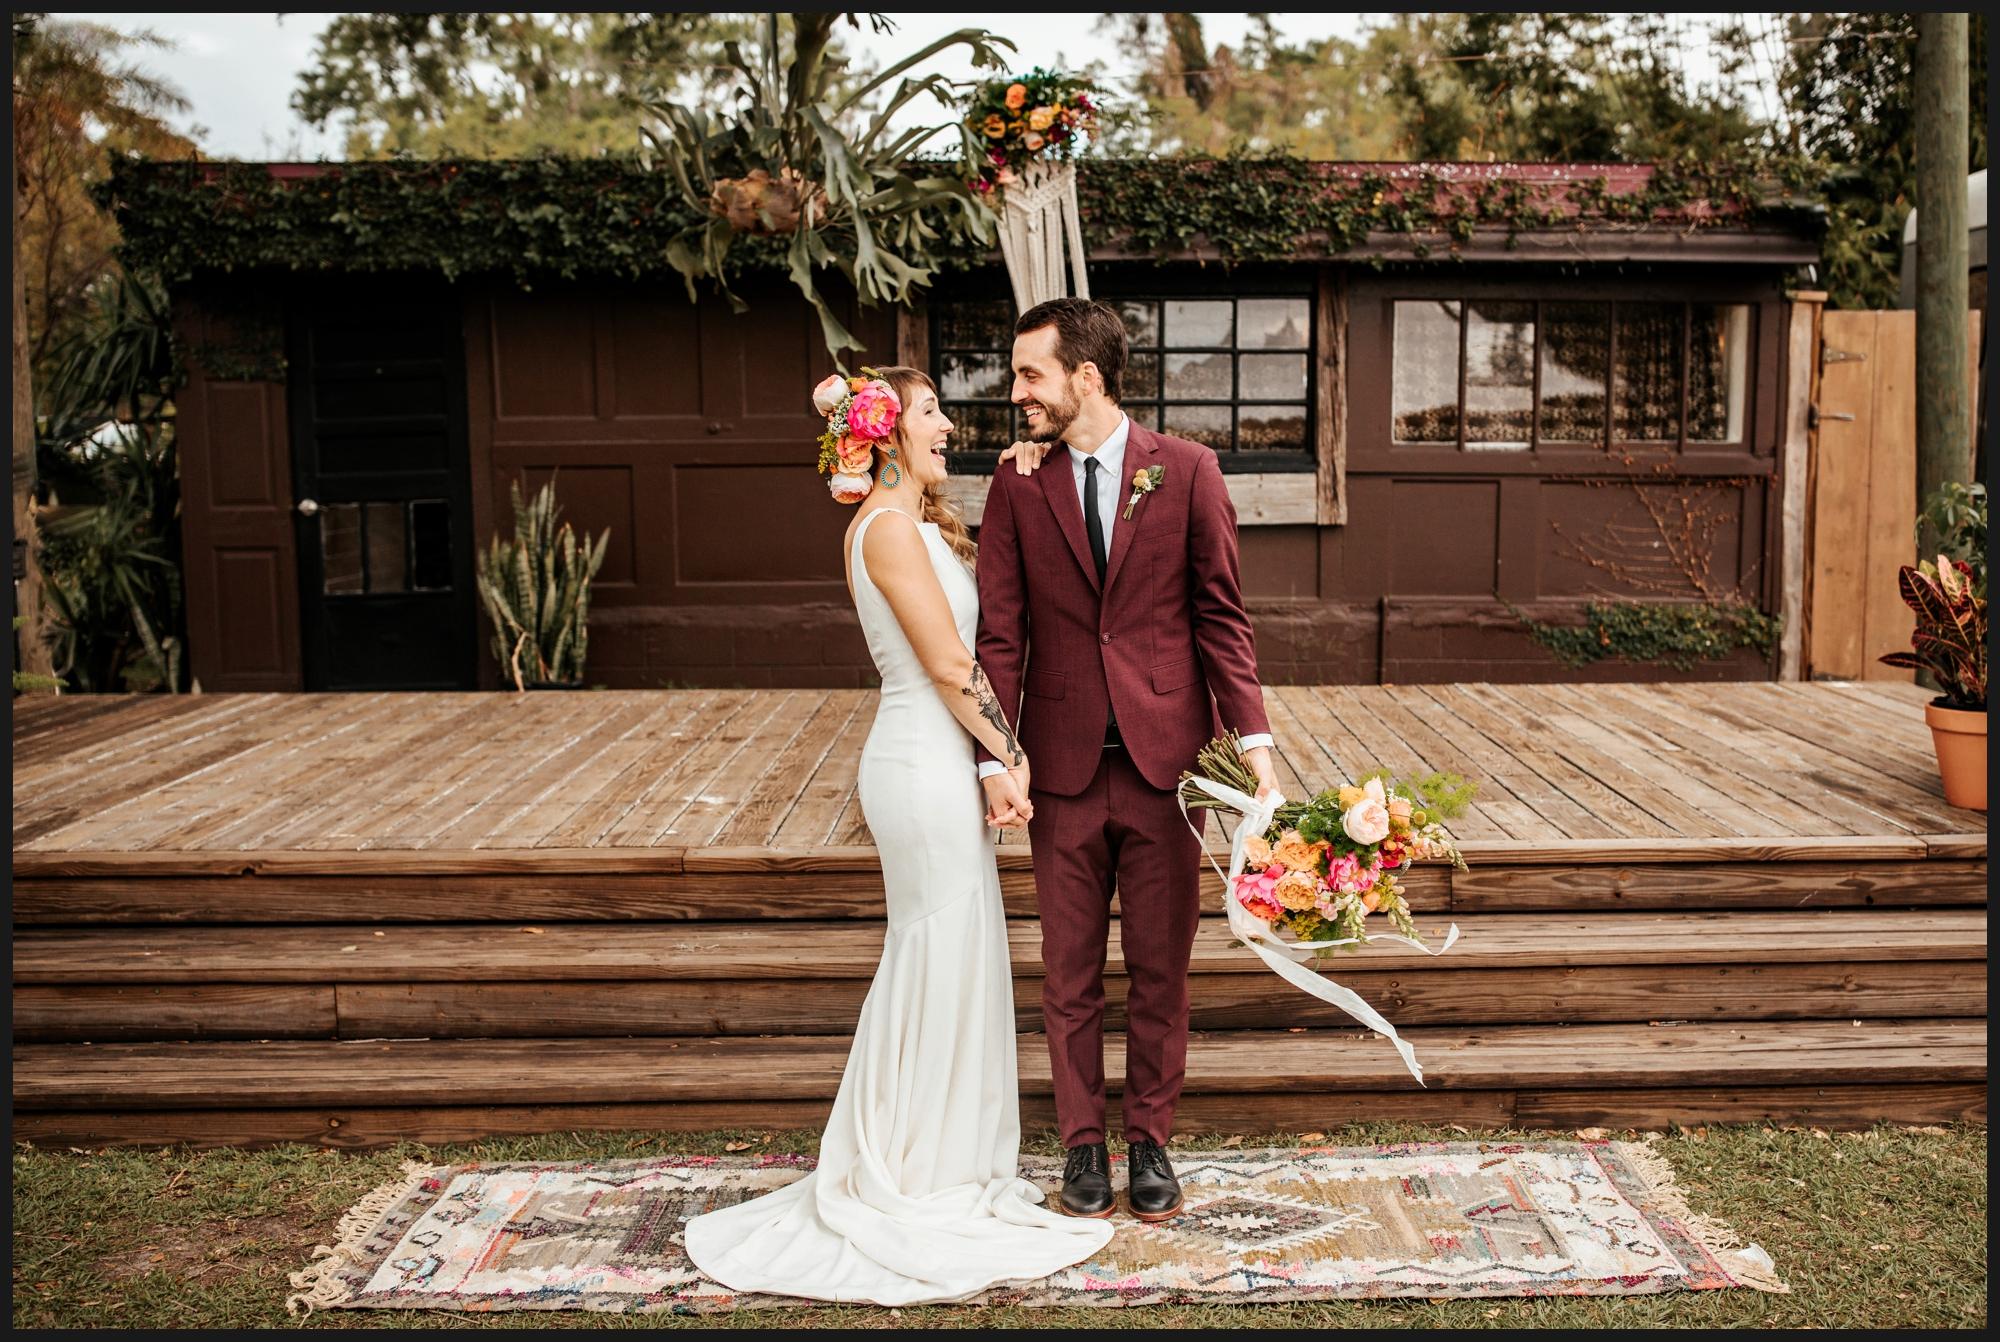 Orlando-Wedding-Photographer-destination-wedding-photographer-florida-wedding-photographer-bohemian-wedding-photographer_2016.jpg